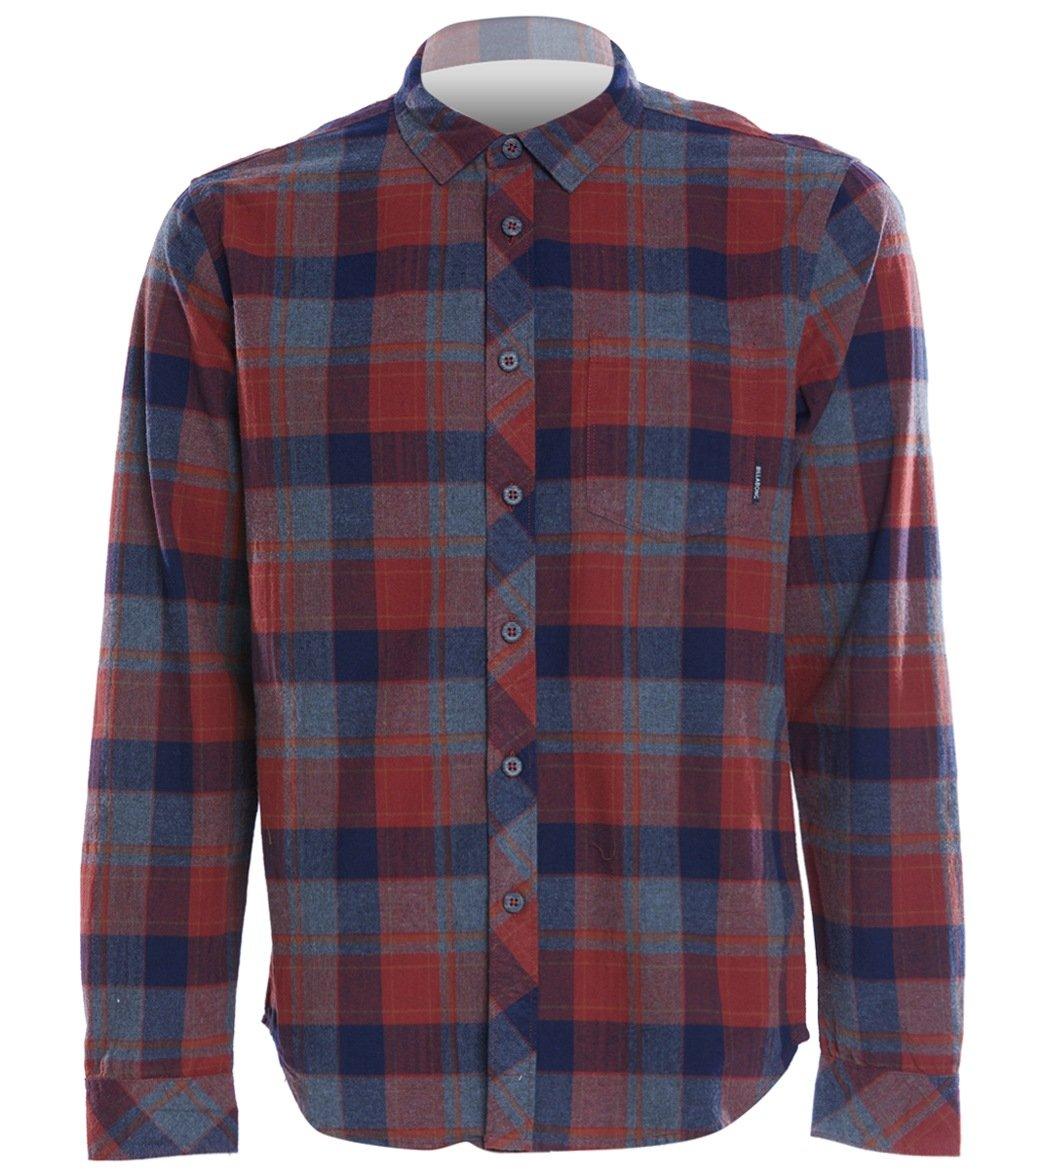 BYWX Men Button Down Splice Lapel Slim Casual Long Sleeve Dress Shirt